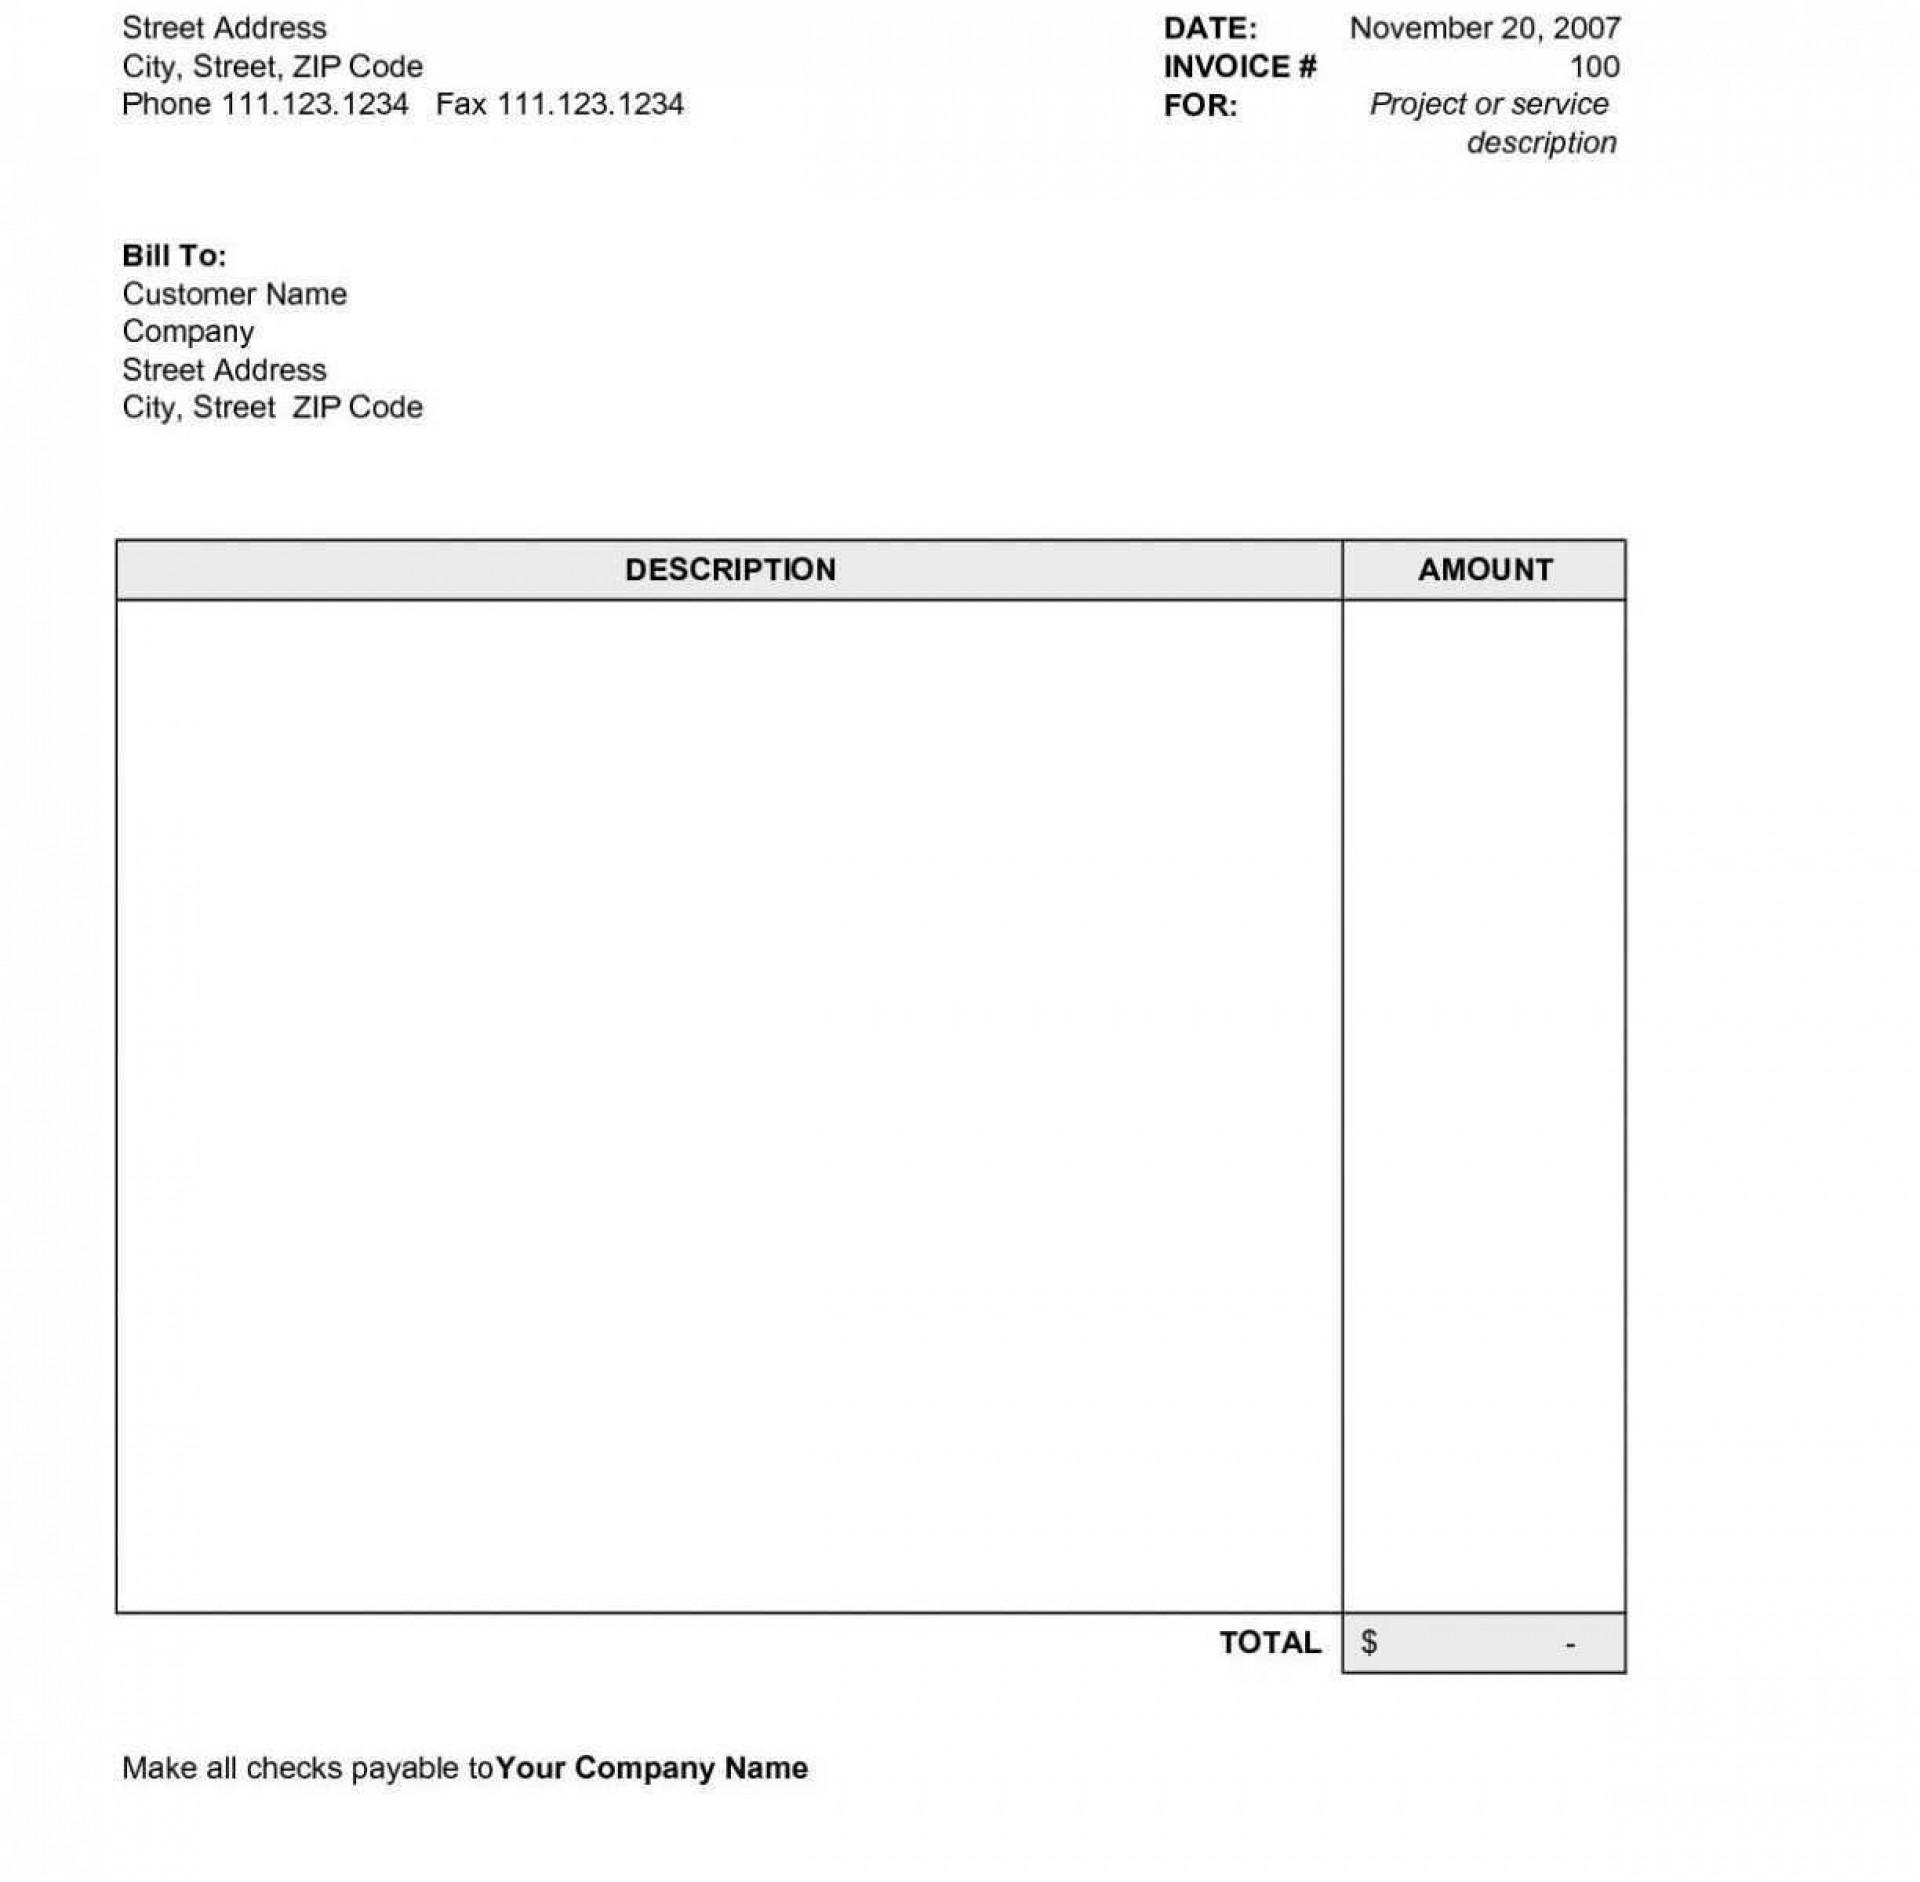 000 Incredible Sample Invoice Template Word Design  Simple Uk Free1920